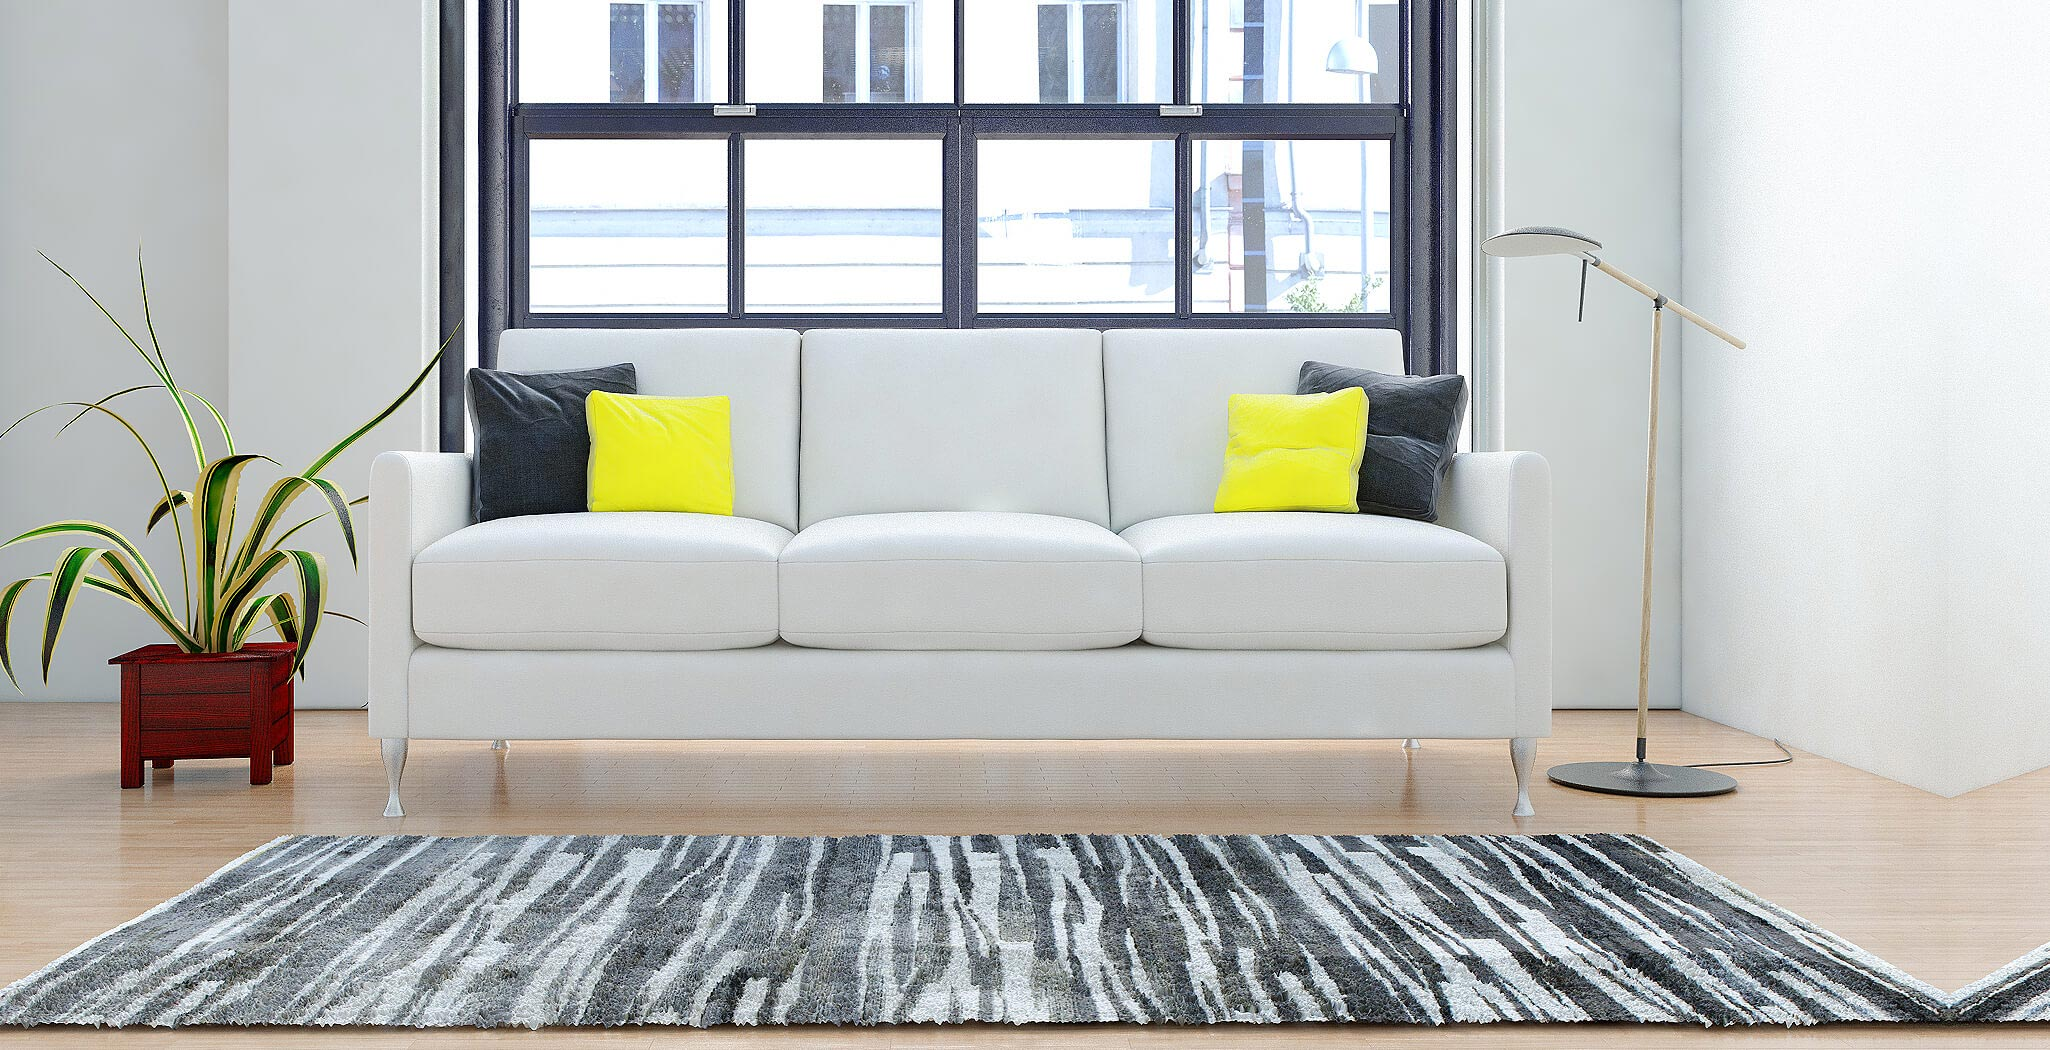 eureka sofa furniture gallery 2